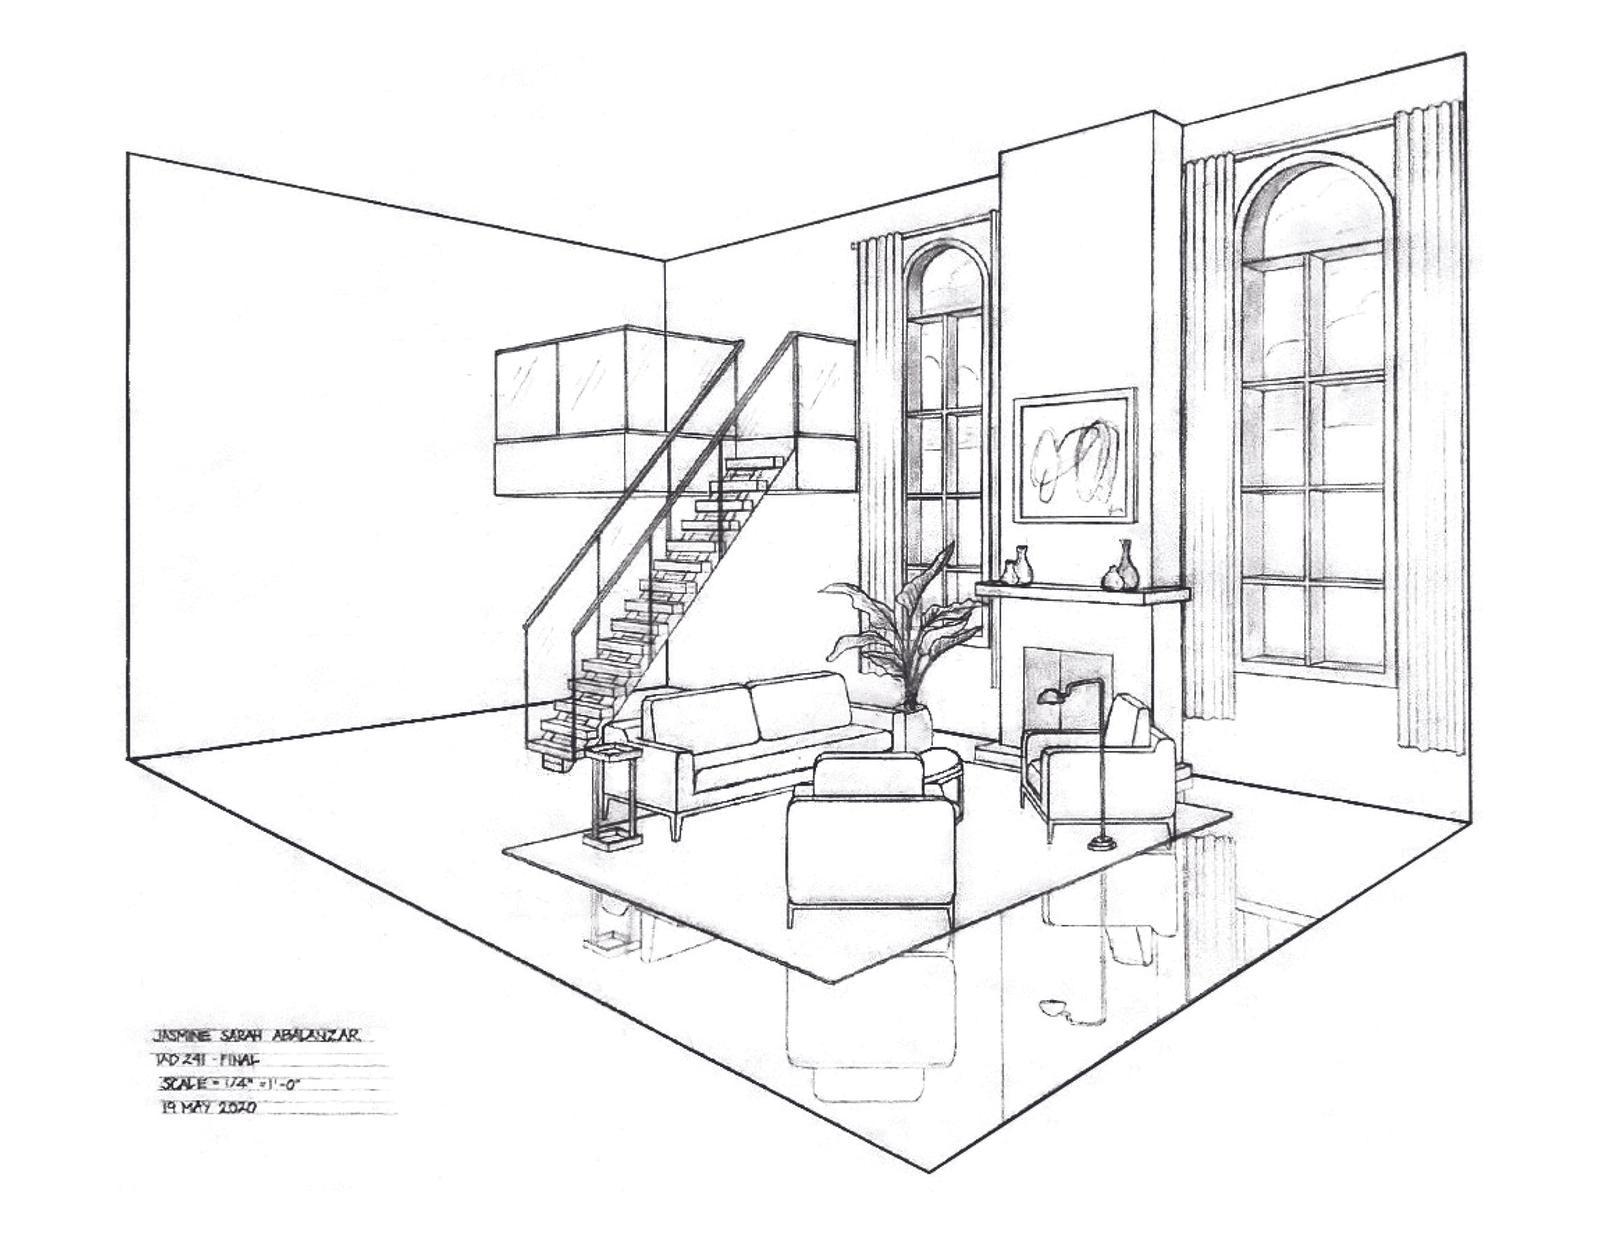 Loft Design - Perspective View